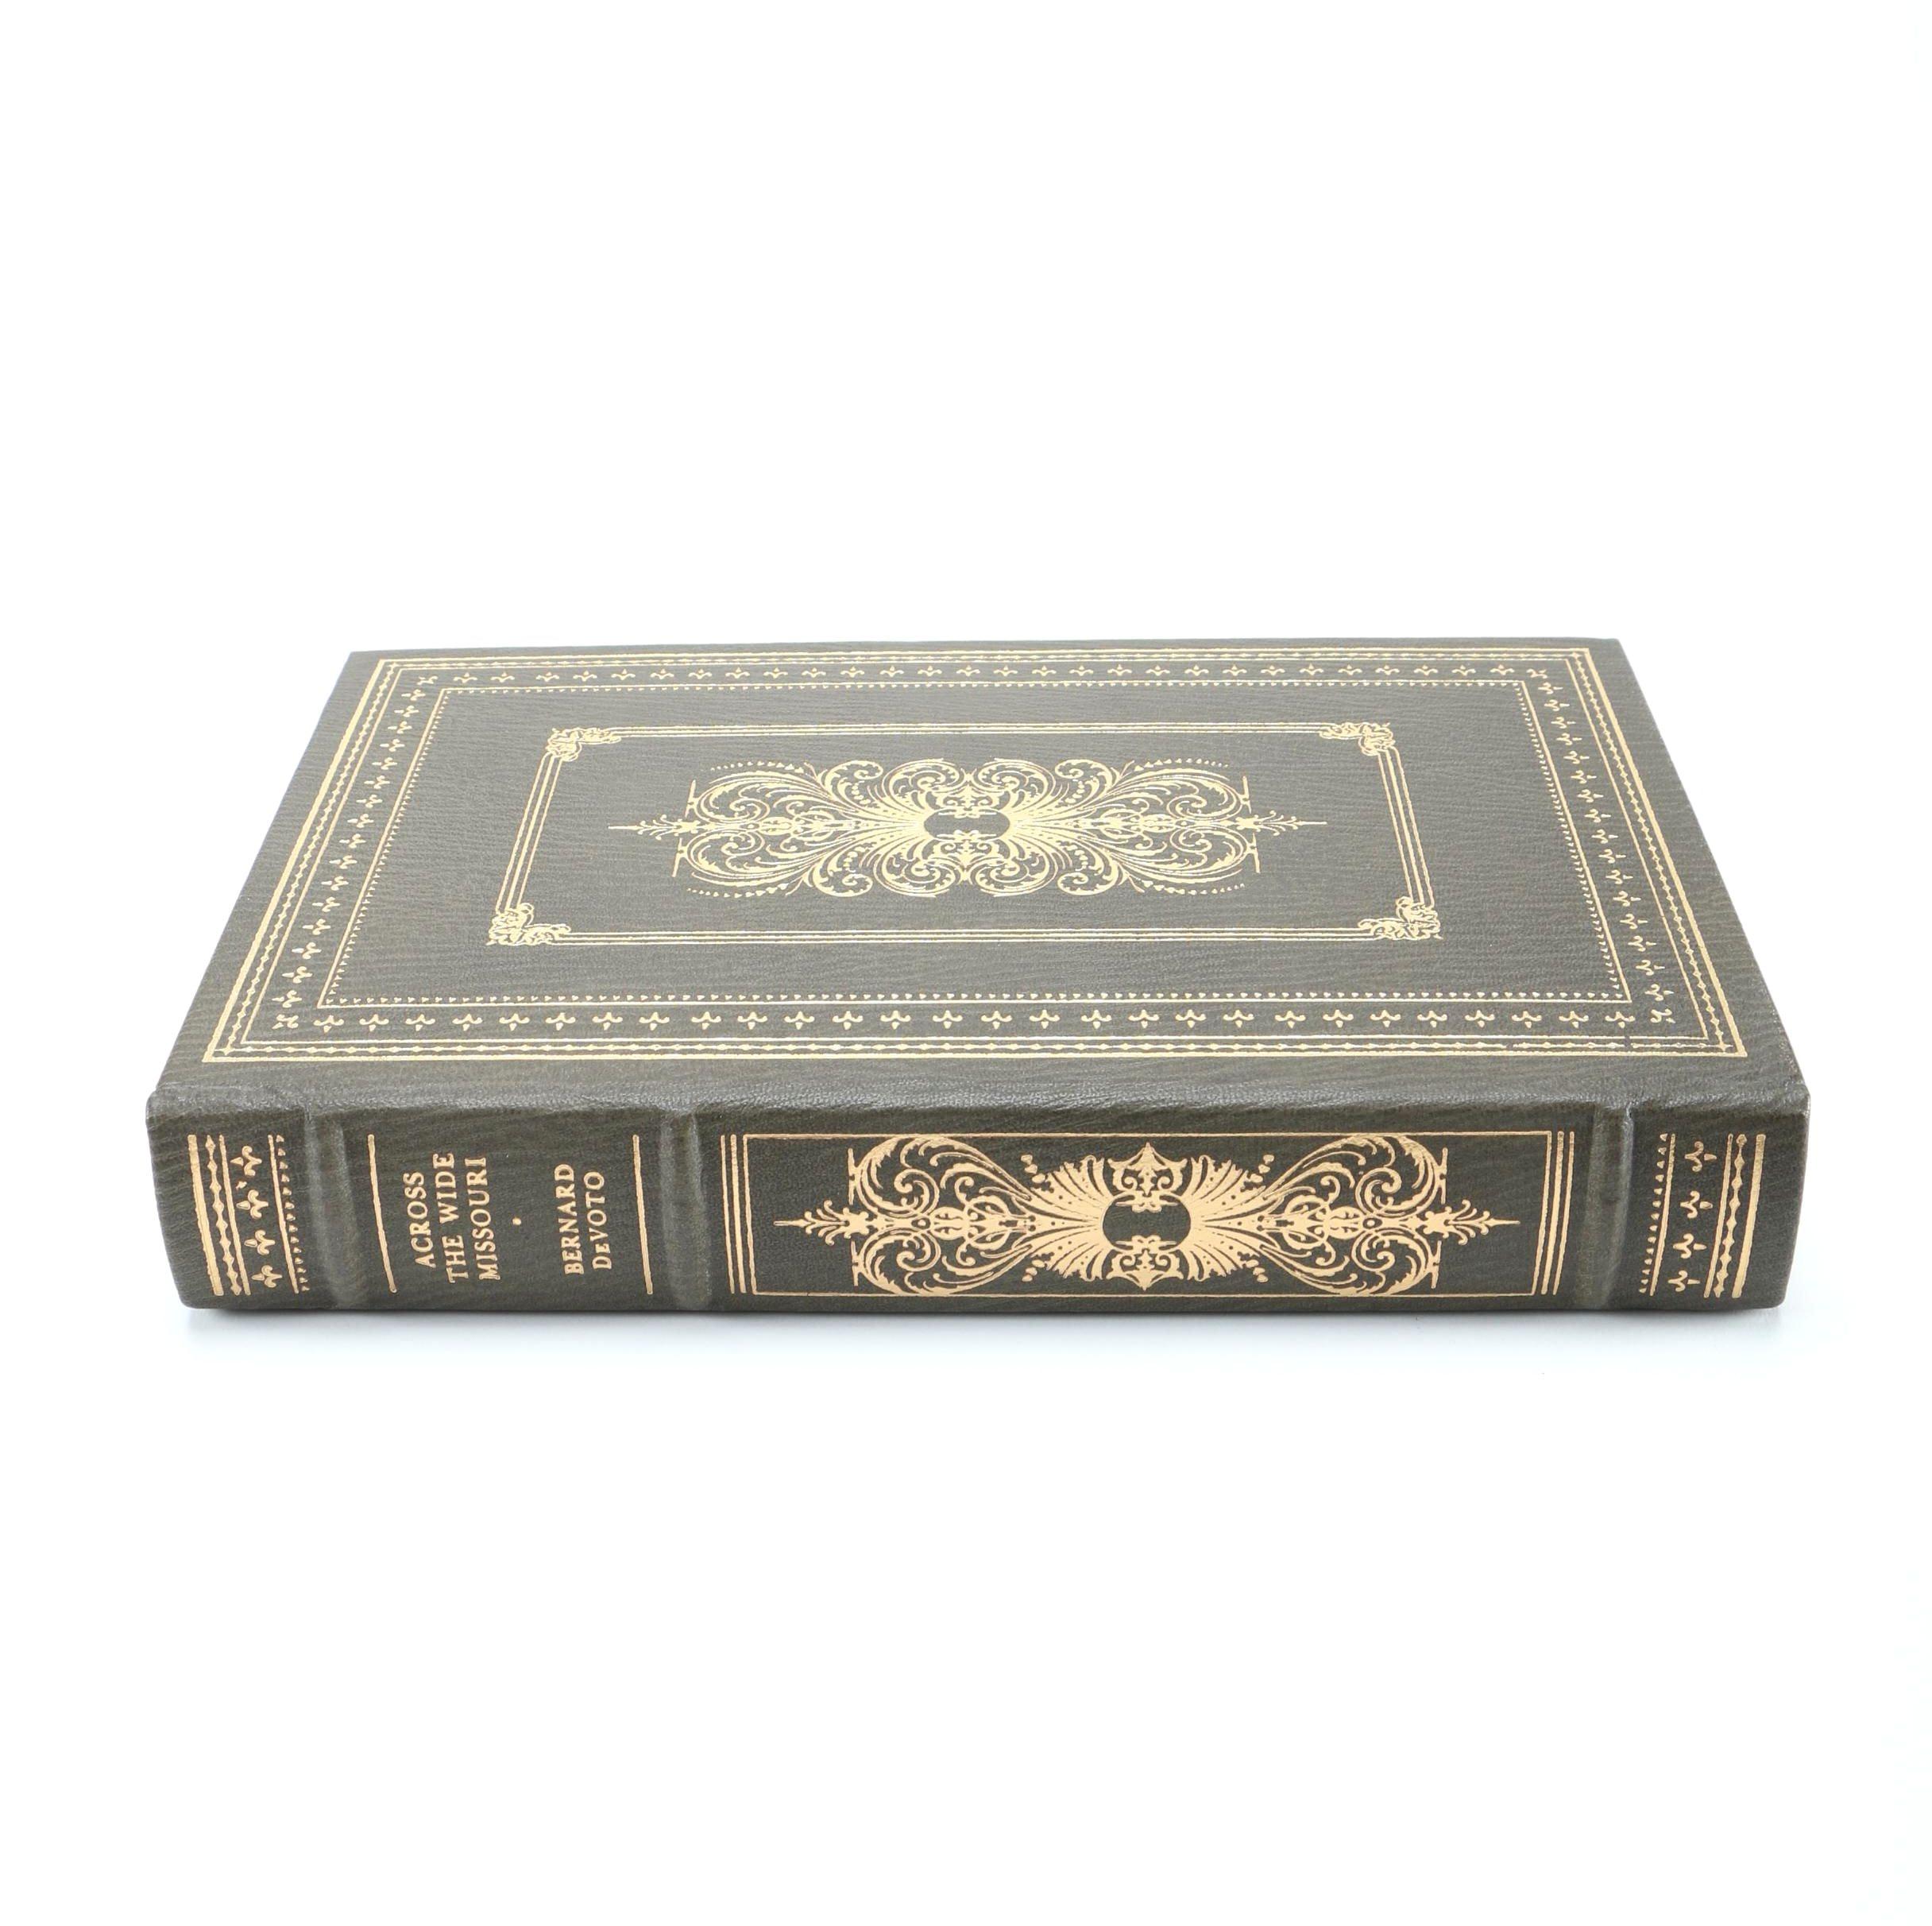 "Franklin Library Edition of ""Across the Wide Missouri"" by Bernard DeVoto"